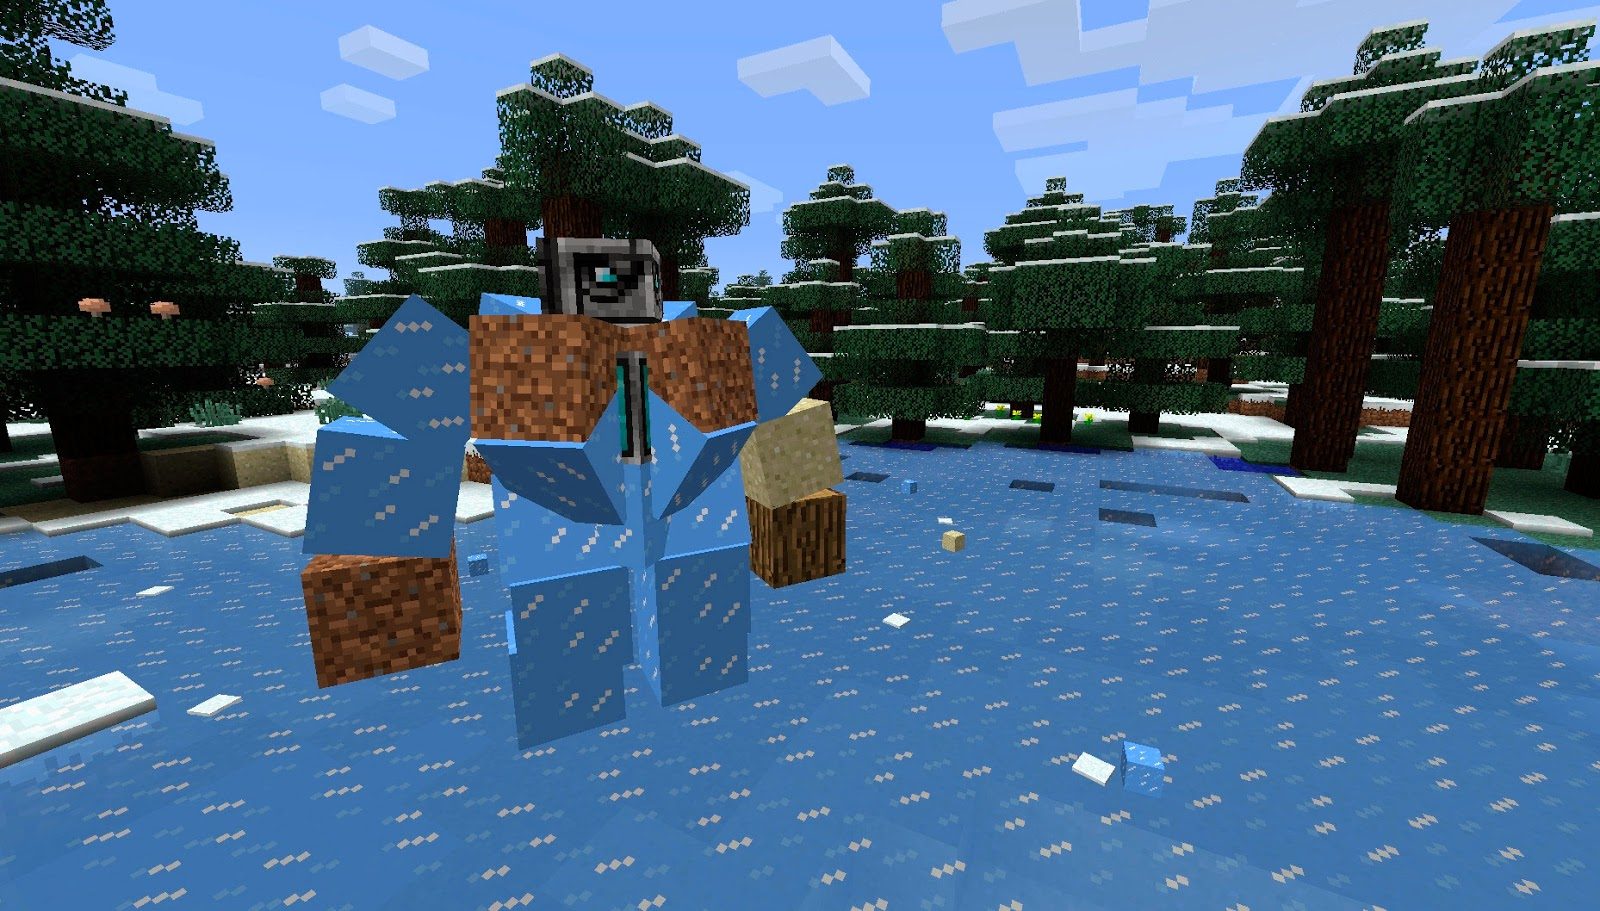 Mo' Creatures golems Minecraft mod